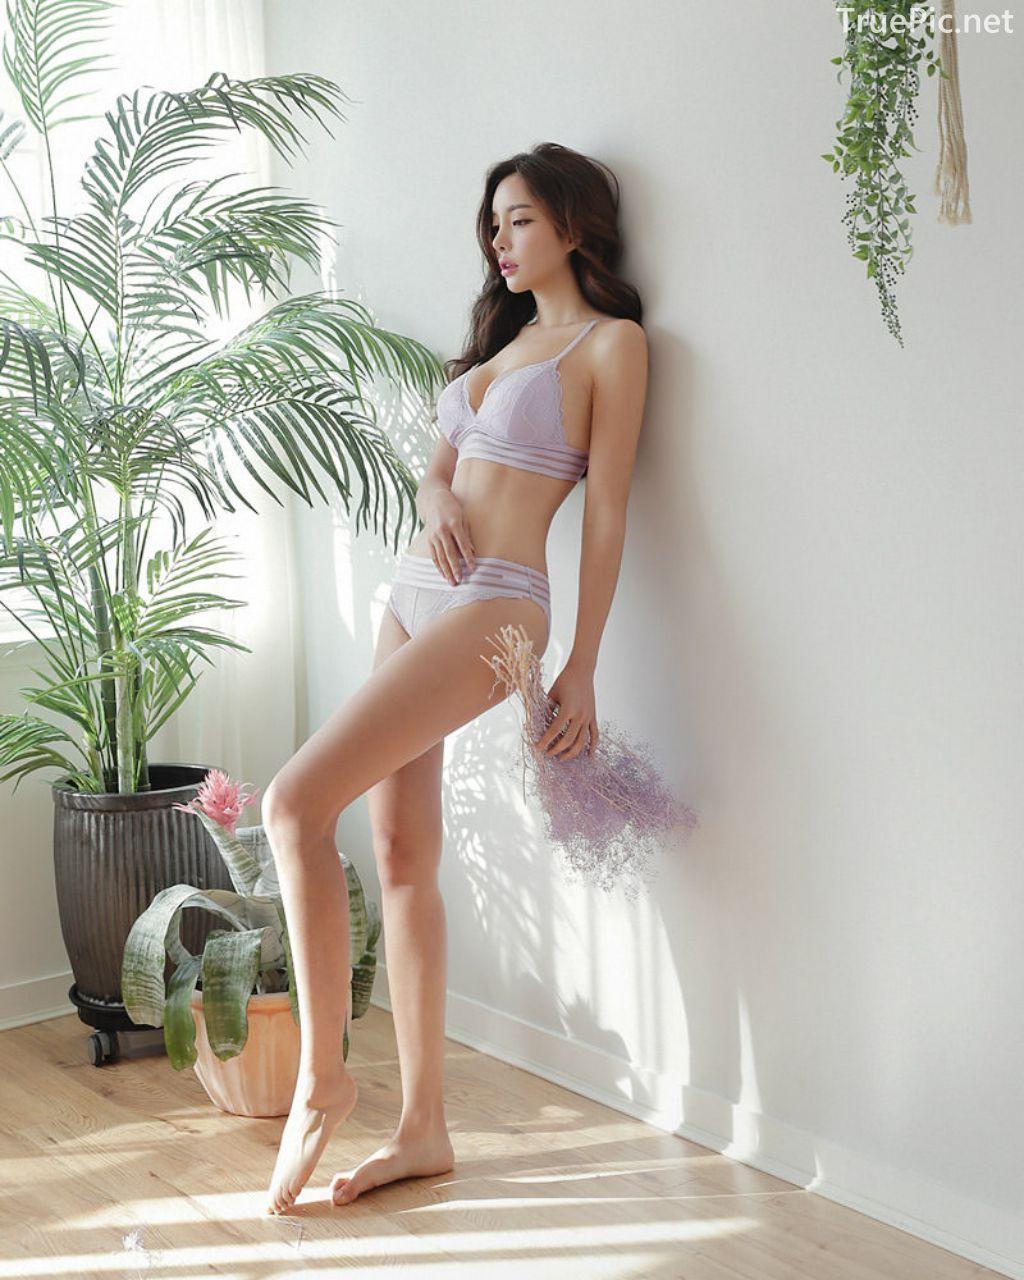 Jin Hee Korean Fashion Model - Love Me Lingerie Collection - TruePic.net - Picture 5